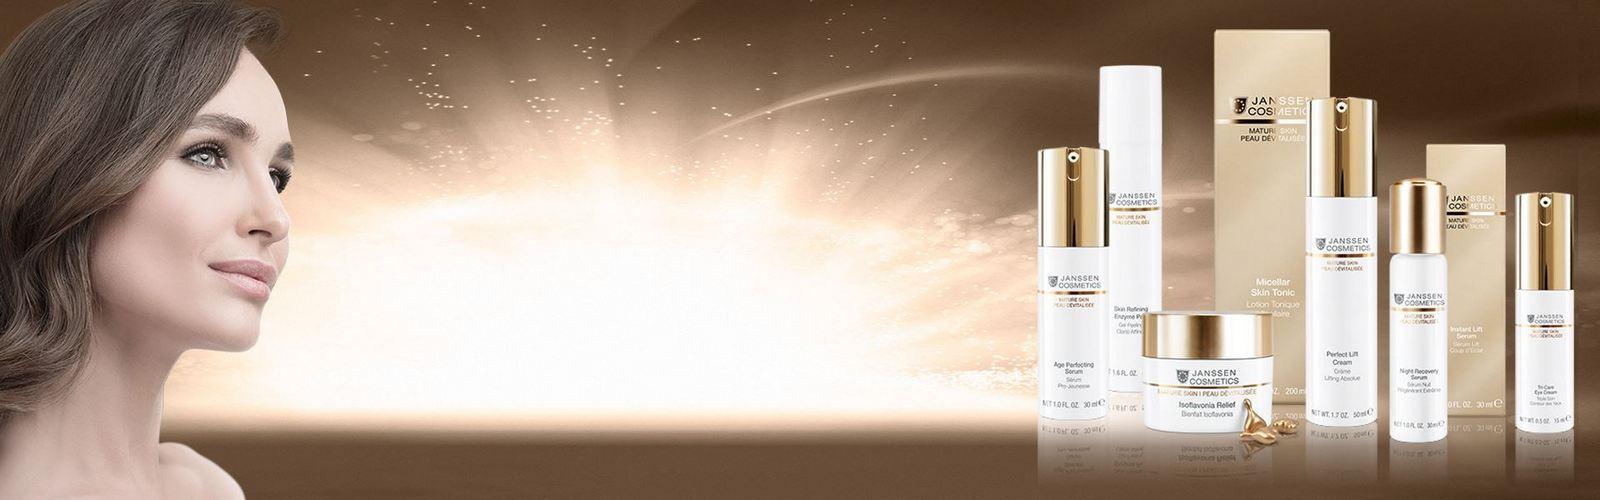 Janssen Cosmetics Mature Skin